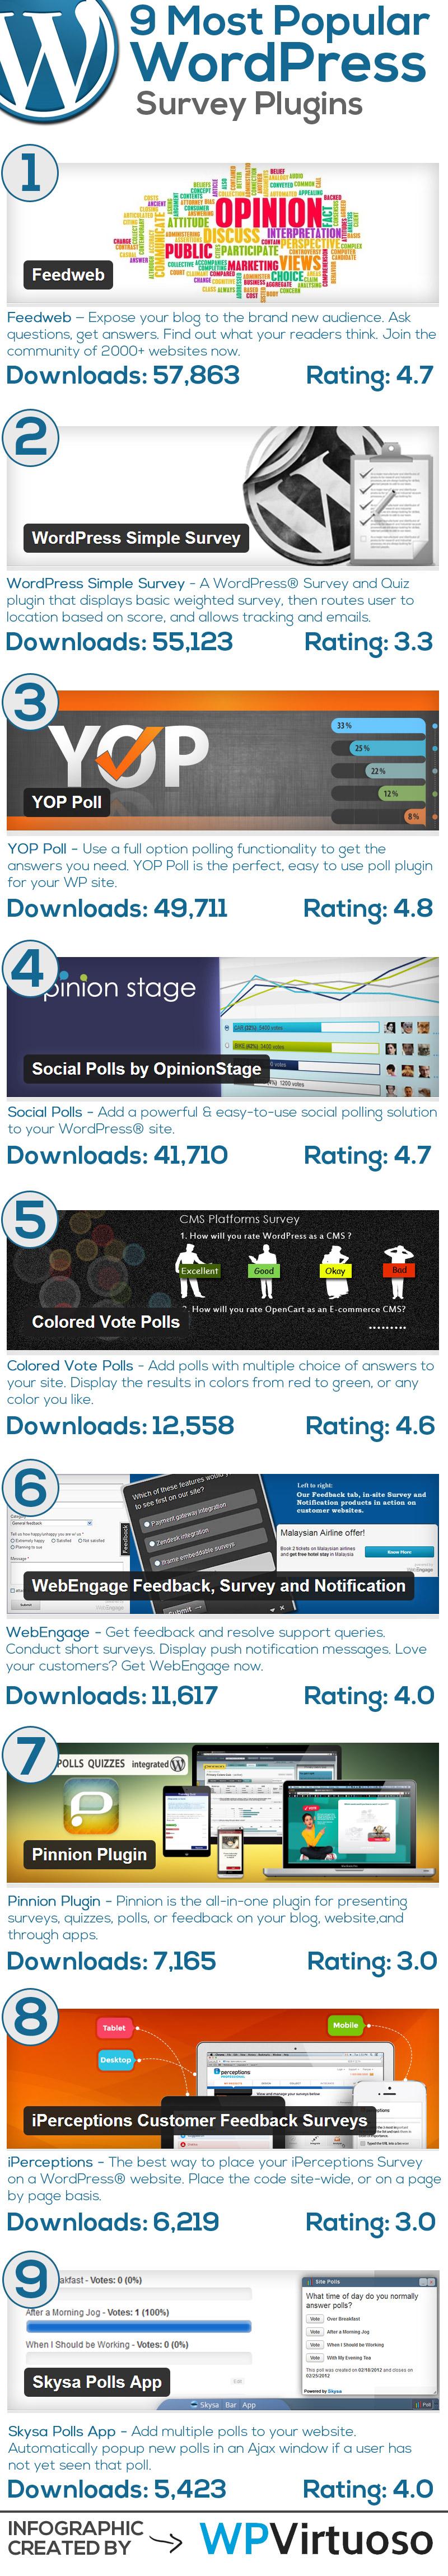 Best-Wordpress-Survey-Plugins-Infographic